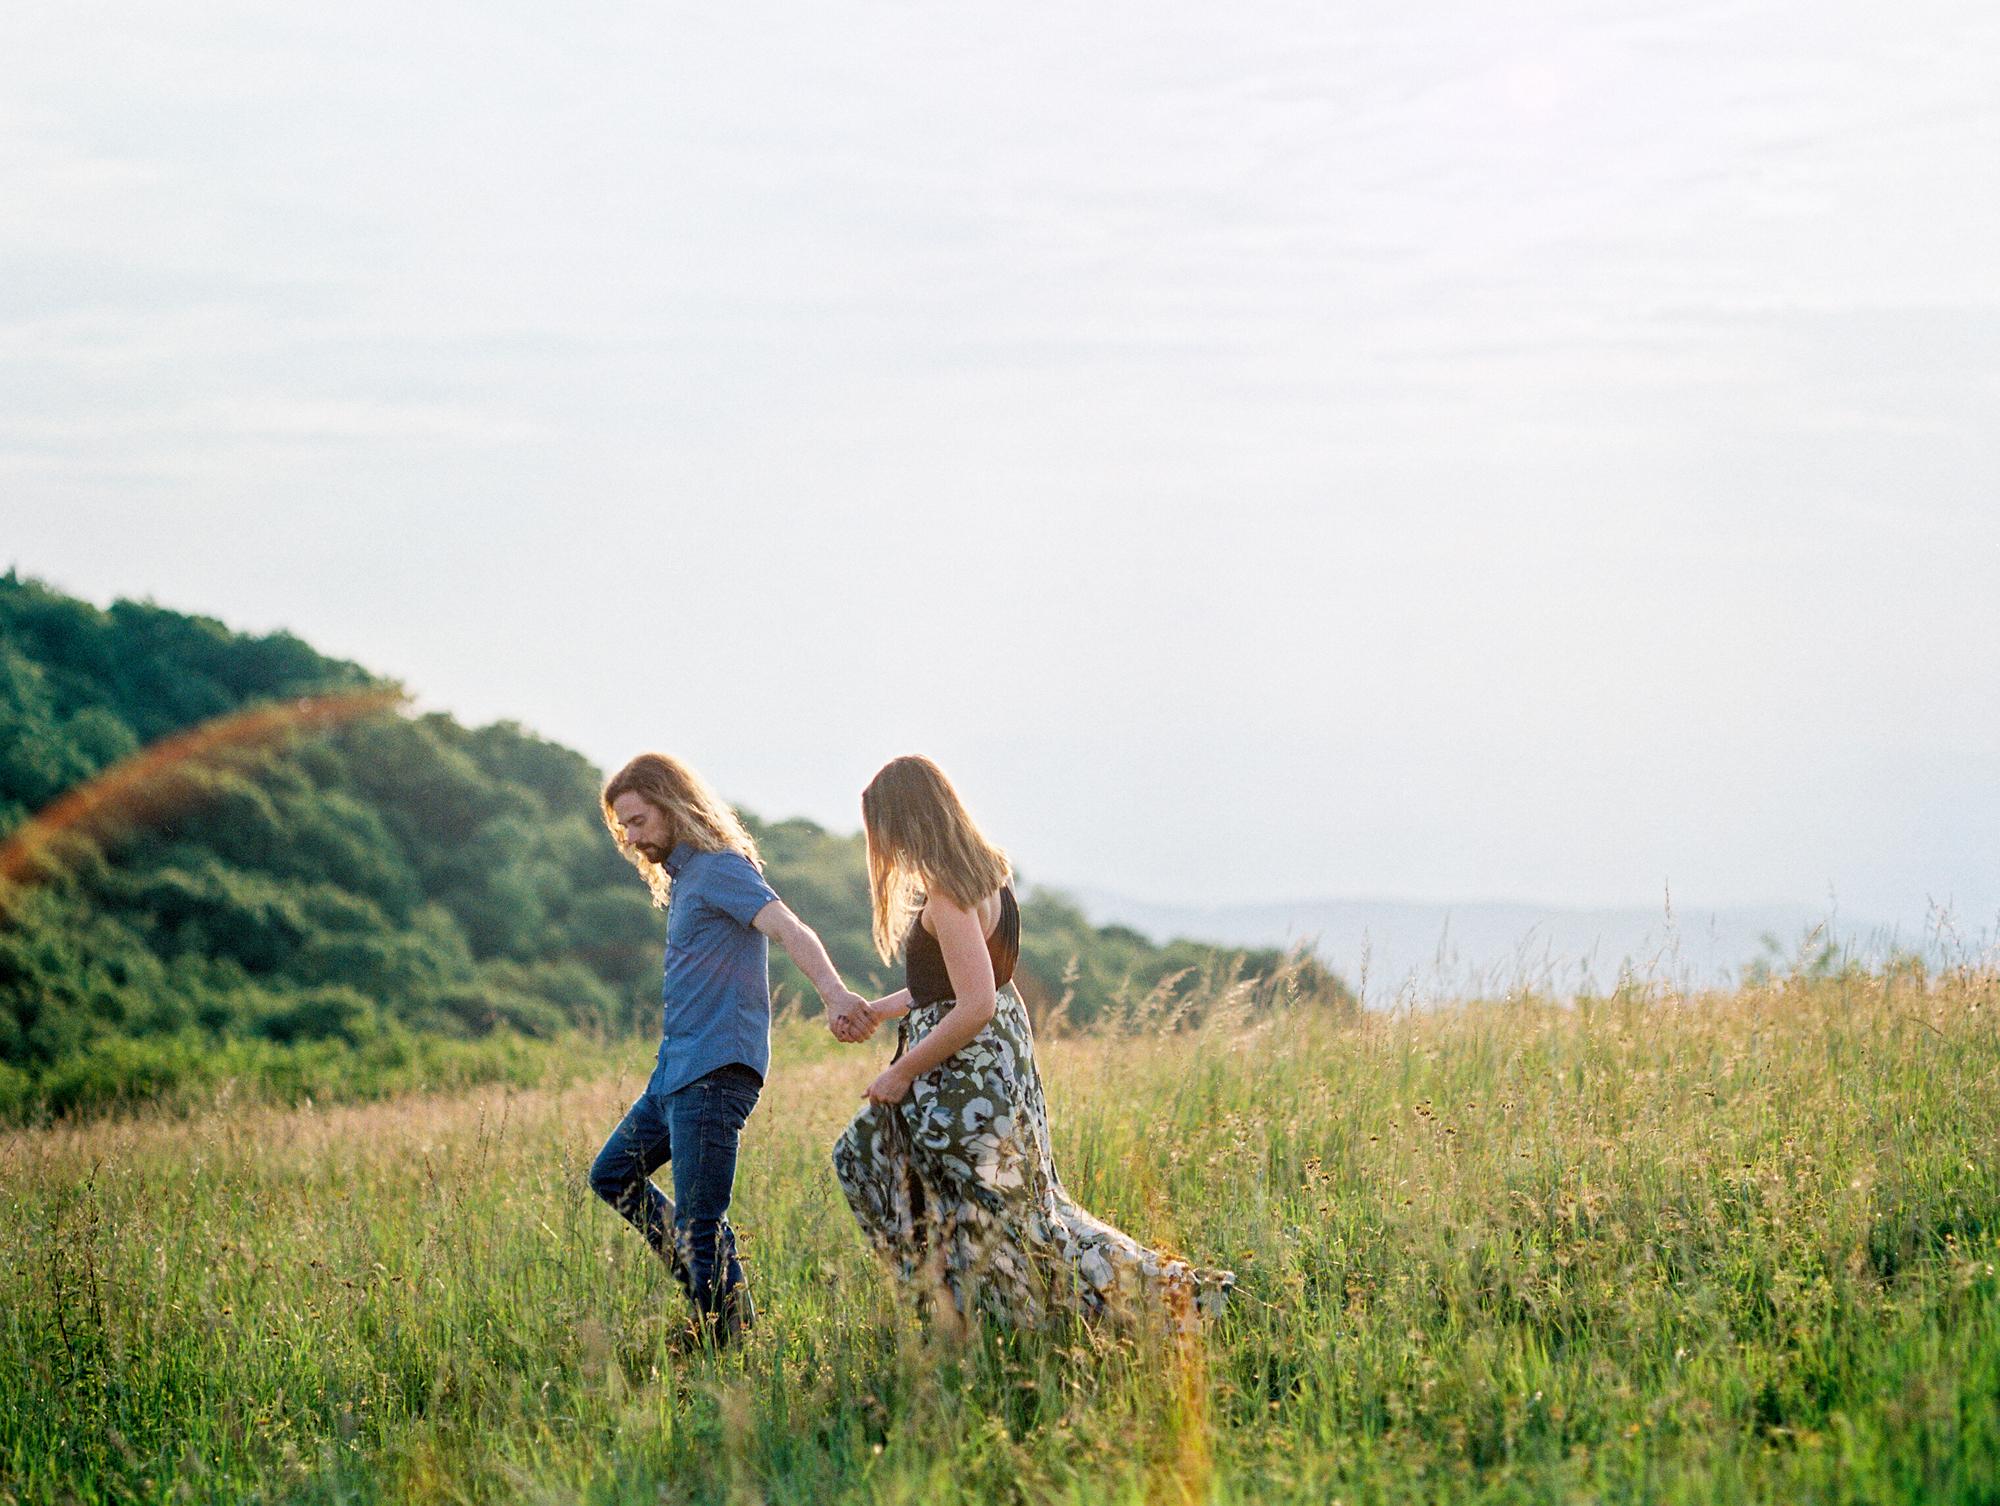 Blue-ridge-mountains-film-wedding-charlottesville-photographer-15.jpg